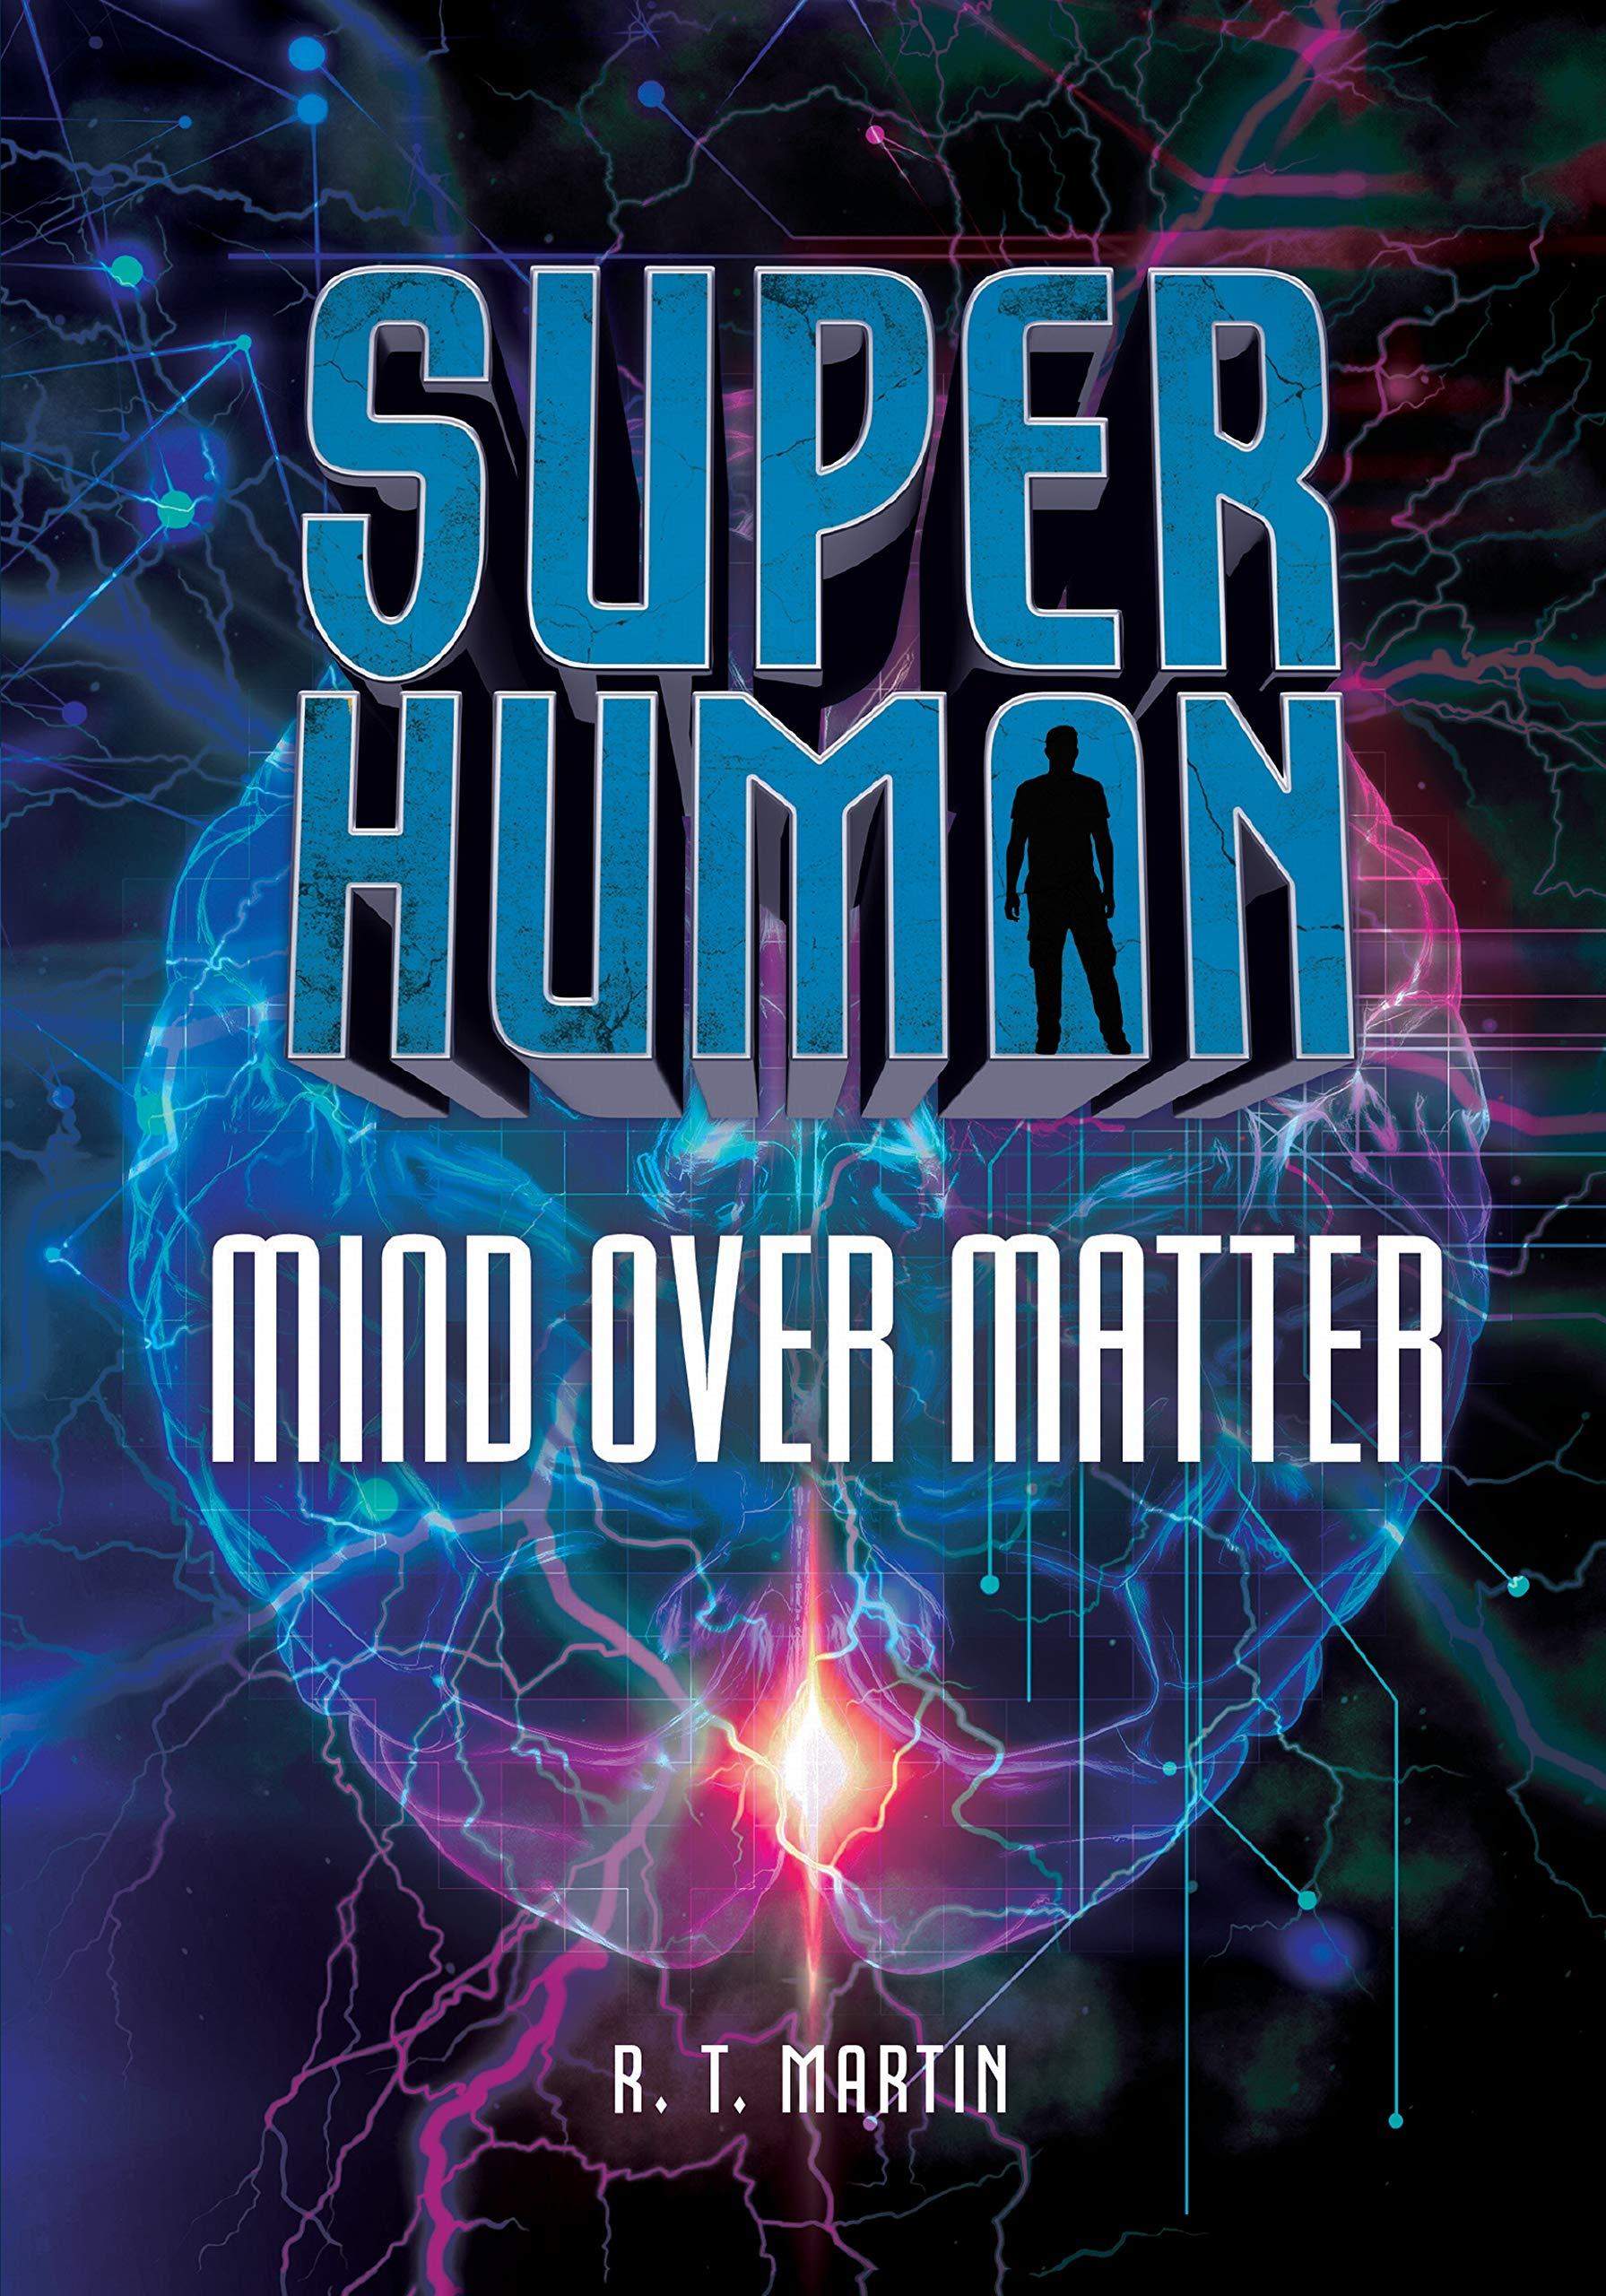 Read Online Mind over Matter (Superhuman) PDF